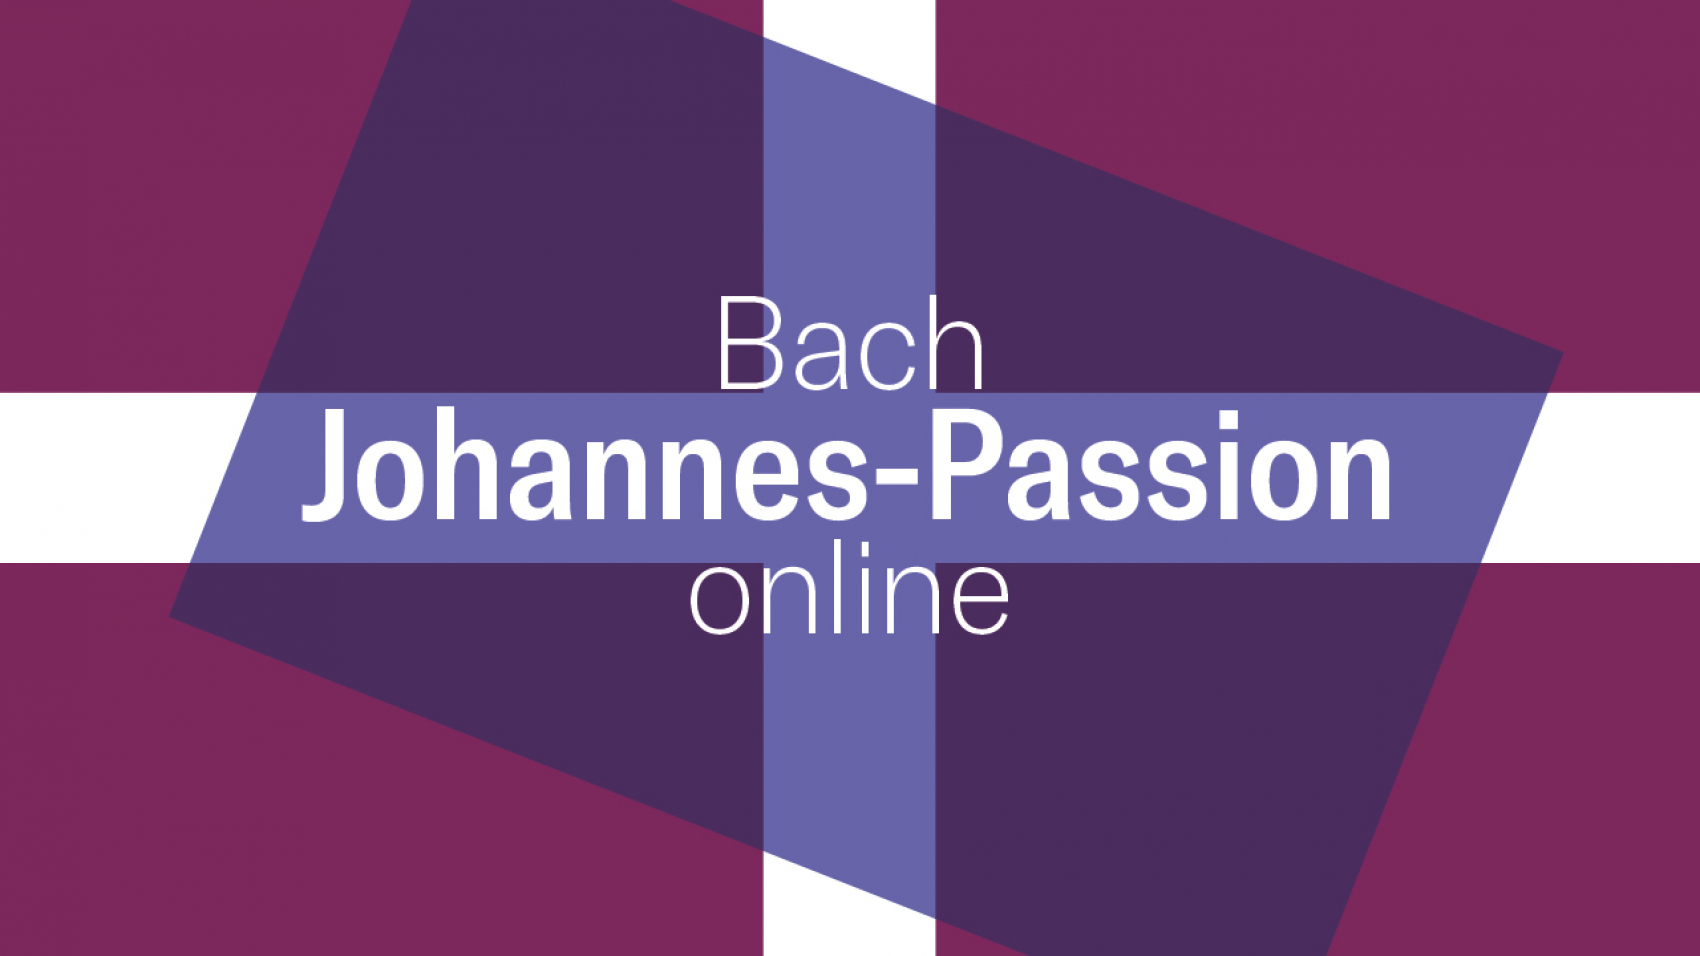 Concertstream: Bachs Johannes-Passion